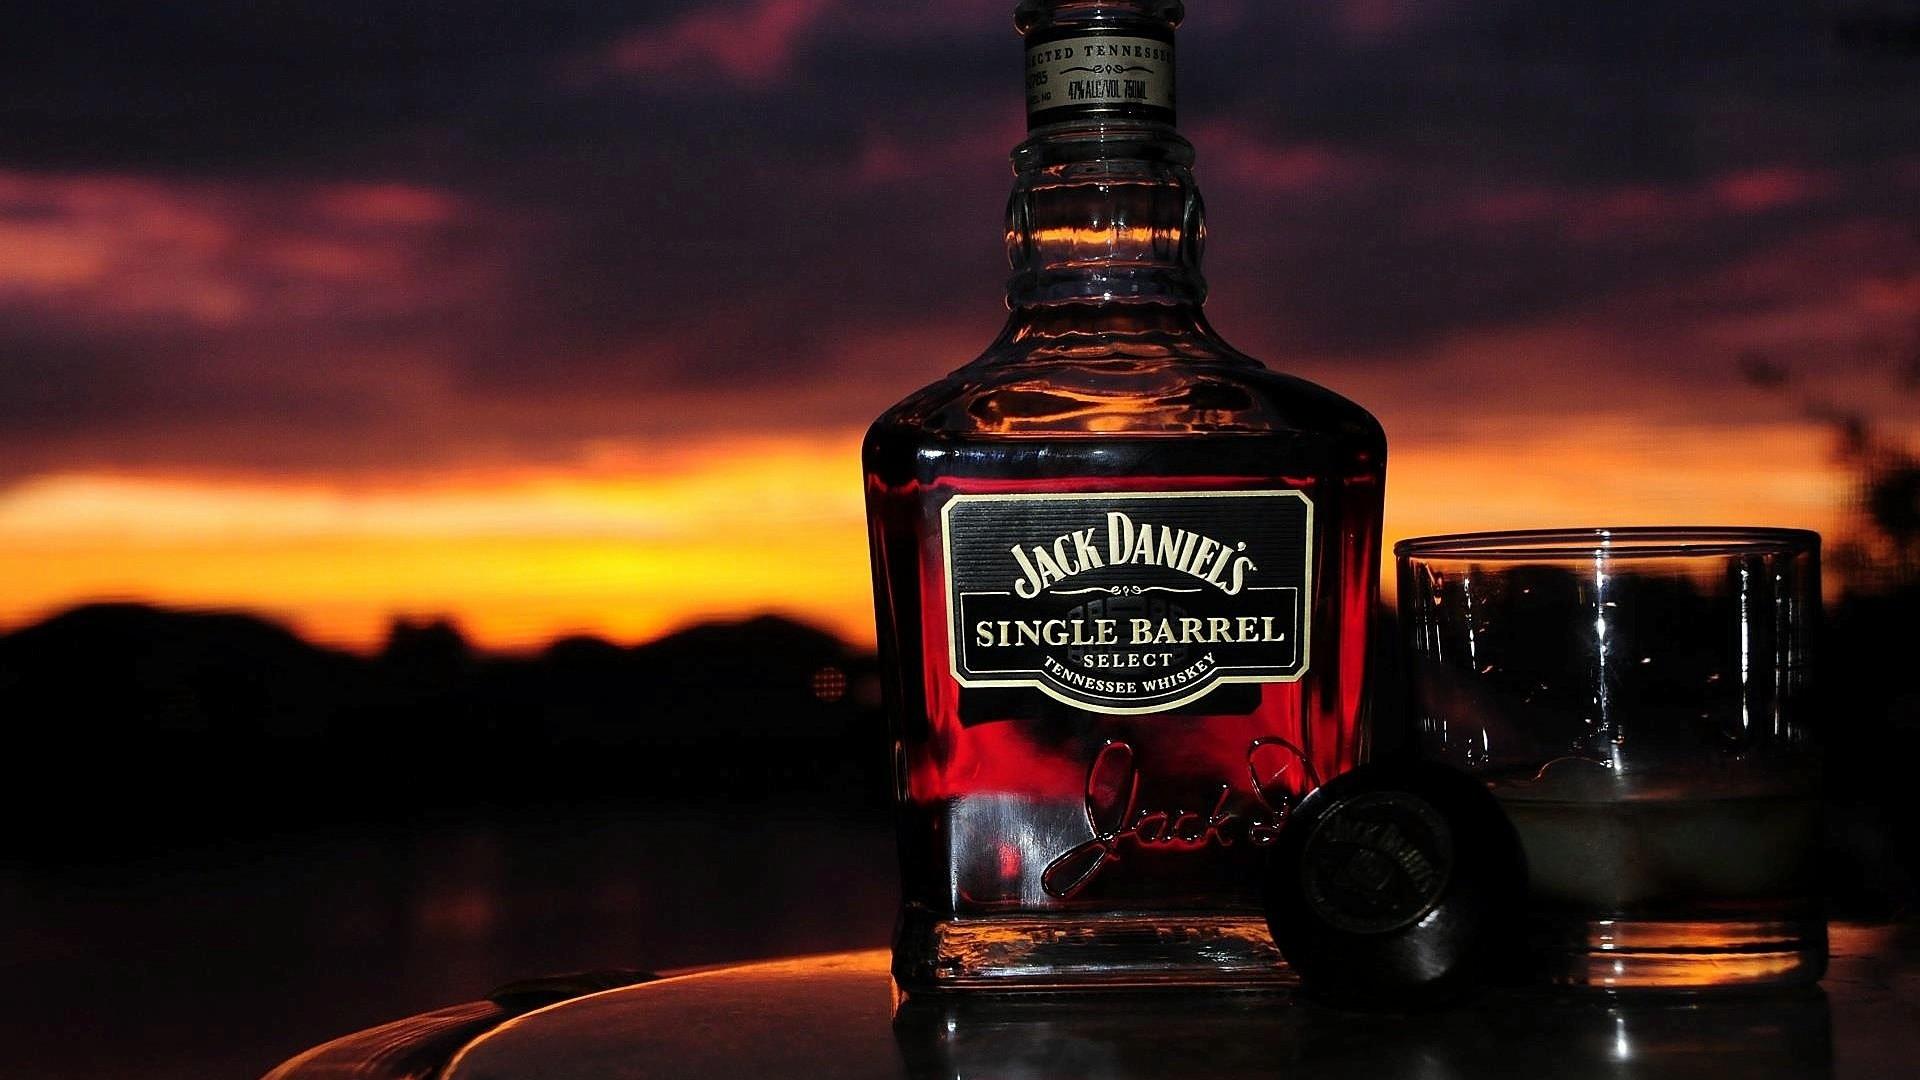 Wallpaper Jack Daniels >> Fireball Whisky Wallpaper (74+ images)